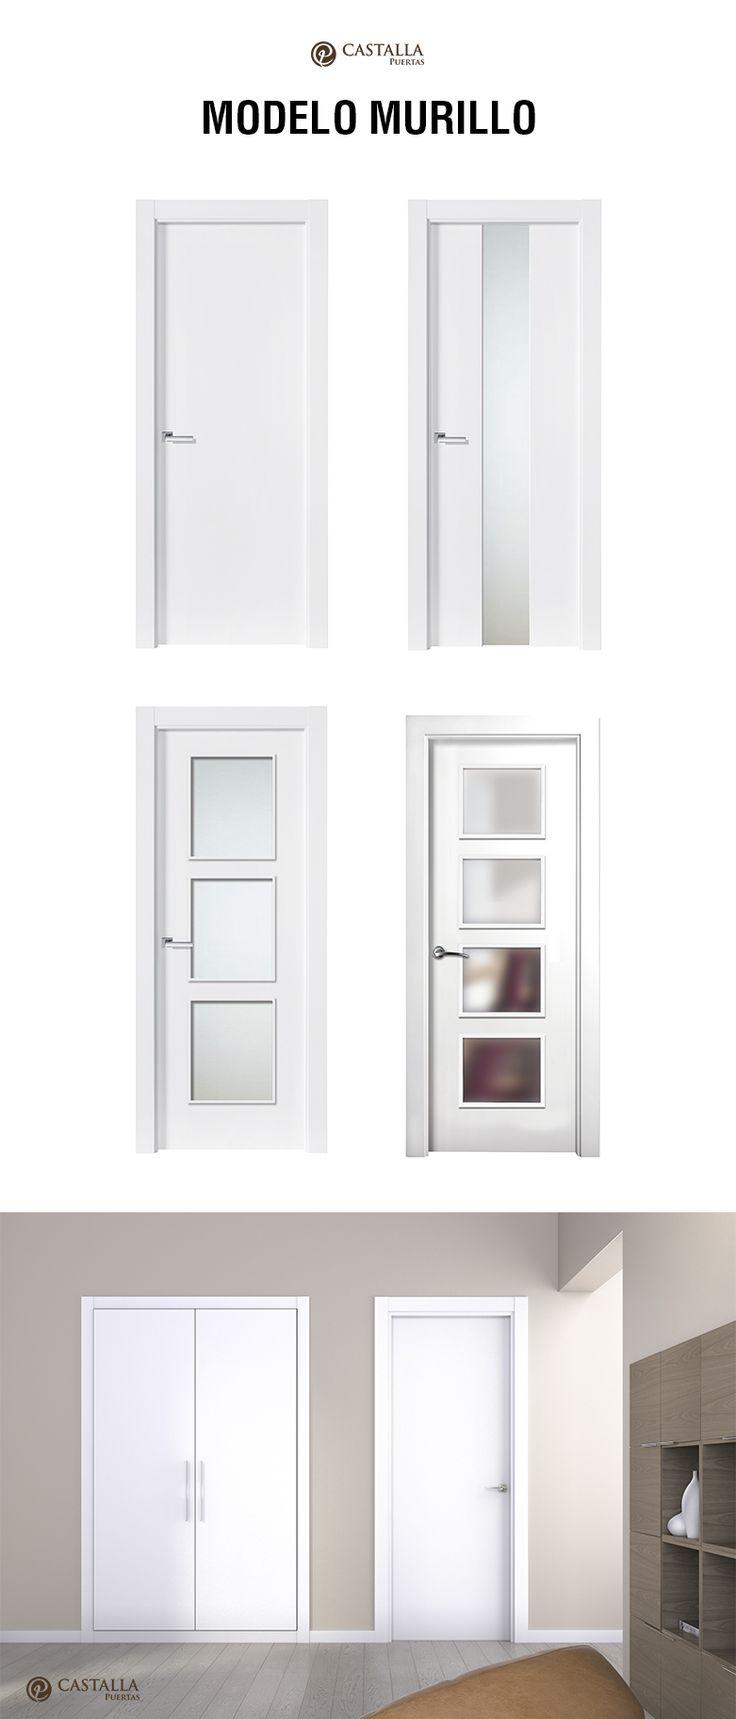 Puerta de interior con cristal Modelo MURILLO. Puertas Castalla | Glass interior door MURILLO. Castalla Doors